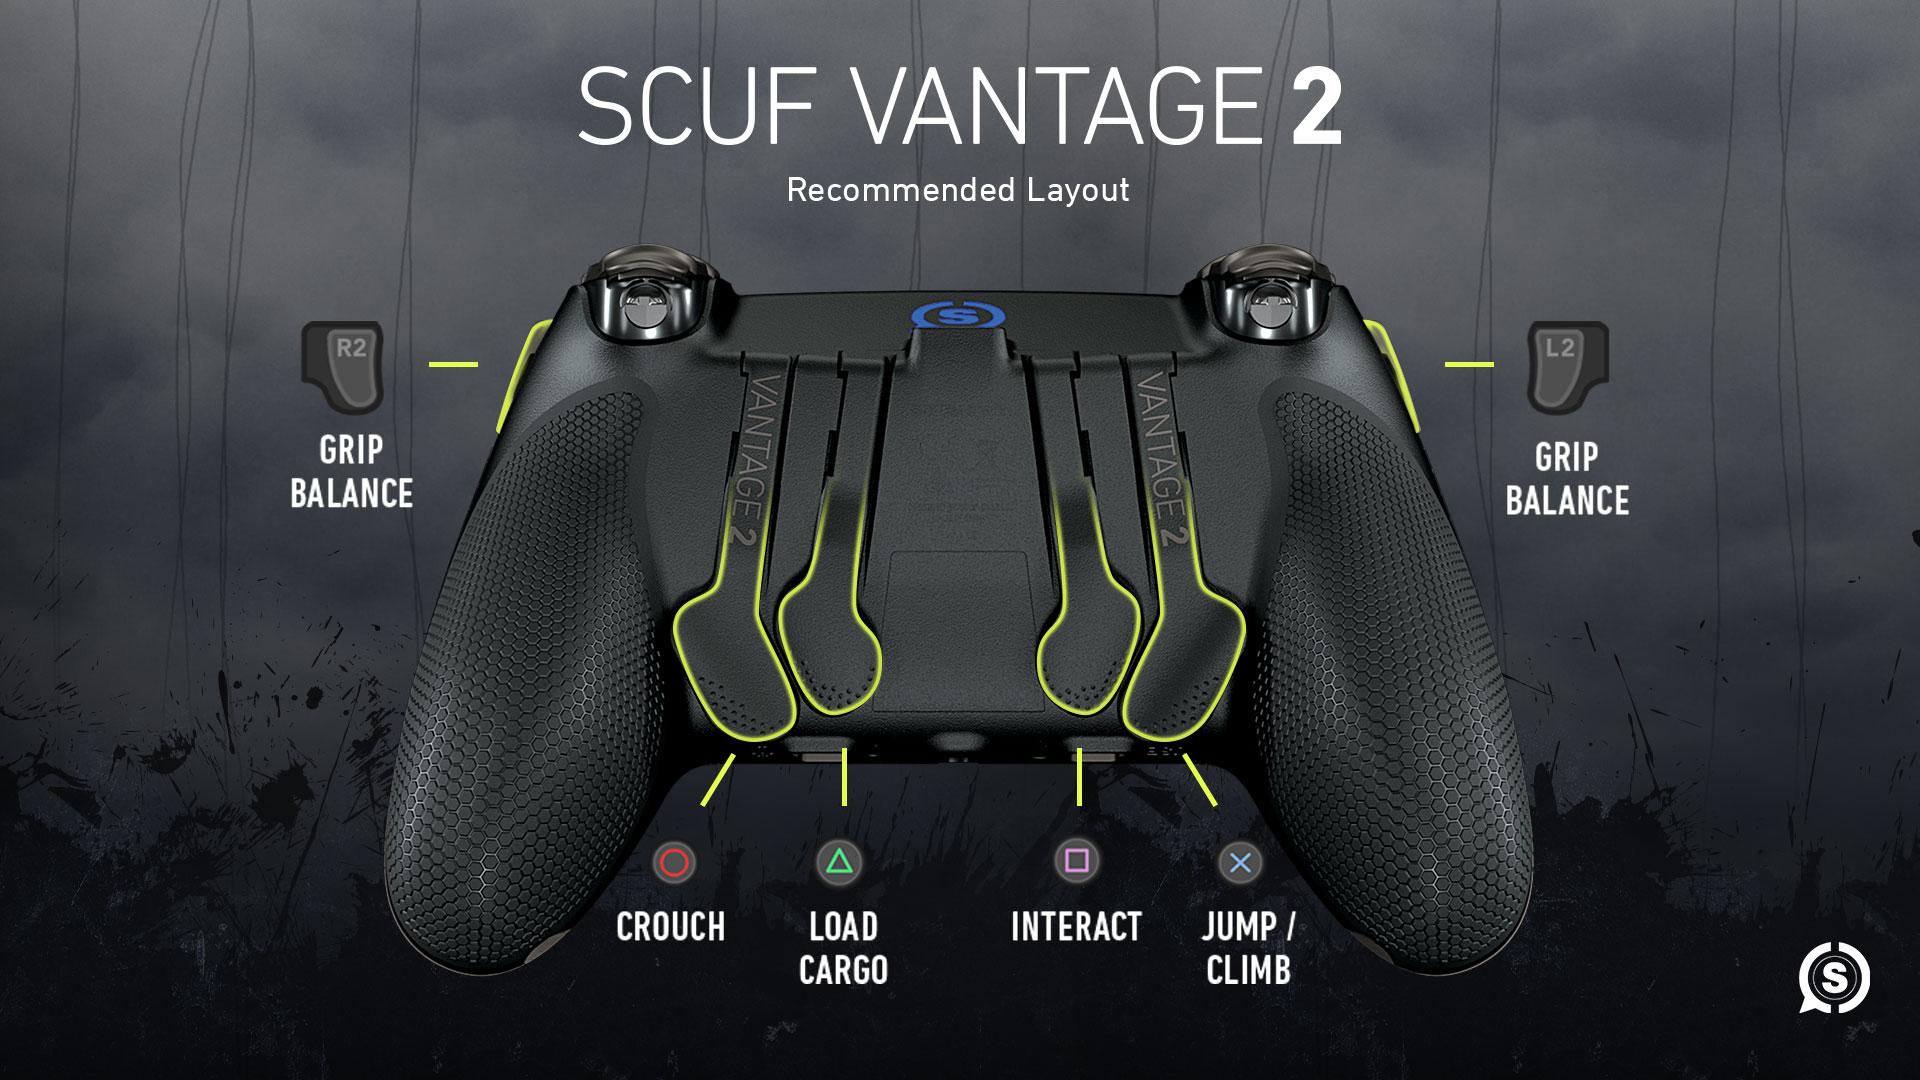 SCUF Vantage 2 Death Stranding Controller Configuration